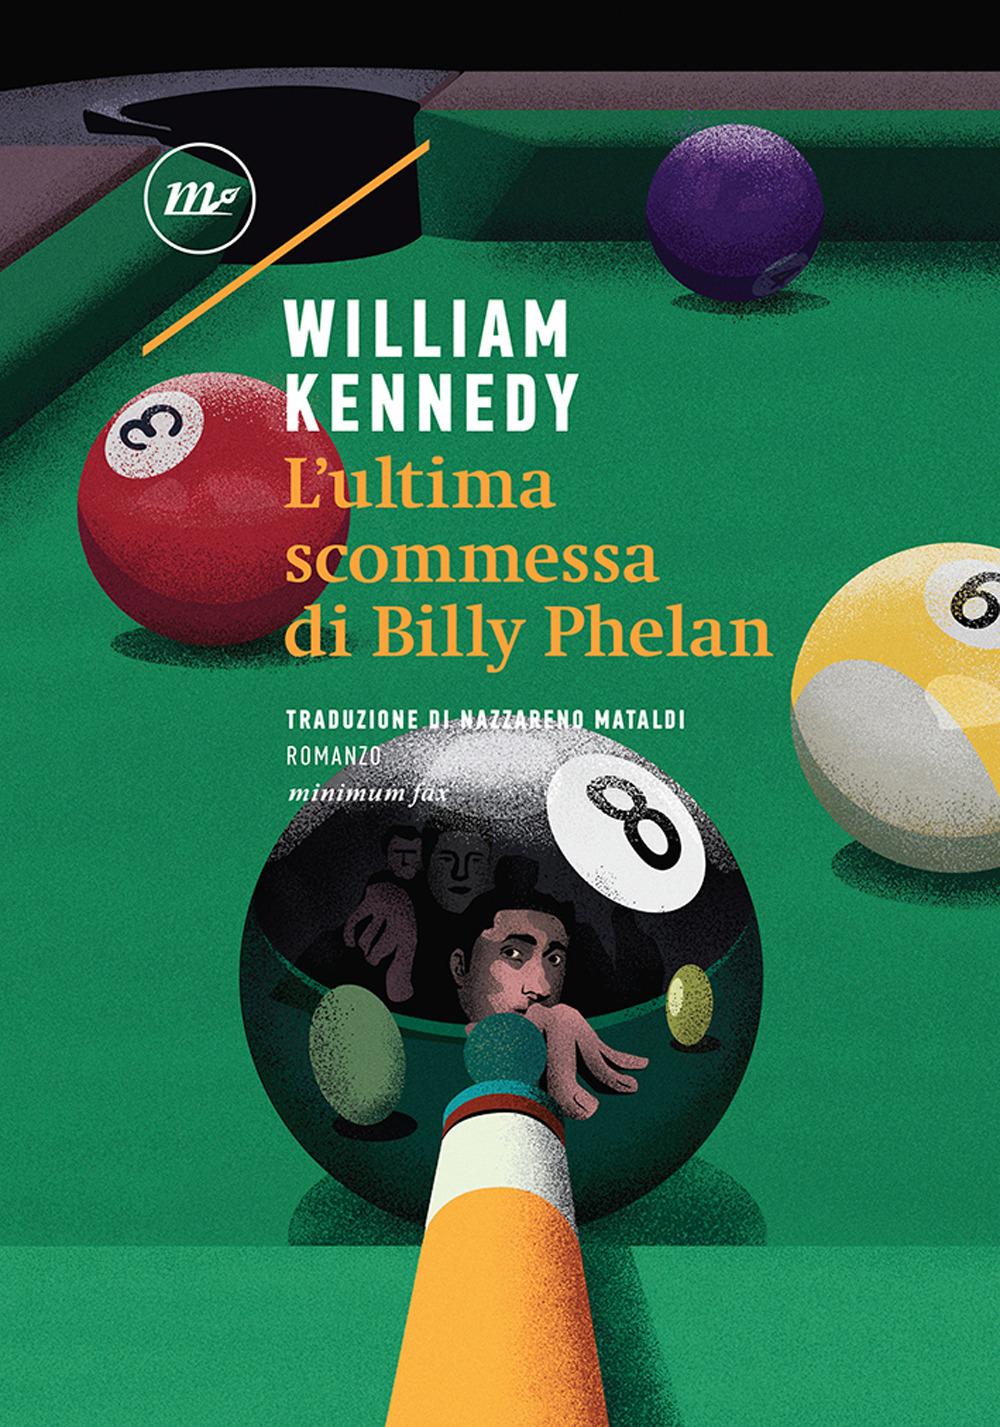 ULTIMA SCOMMESSA DI BILLY PHELAN (L') - Kennedy William - 9788833891958